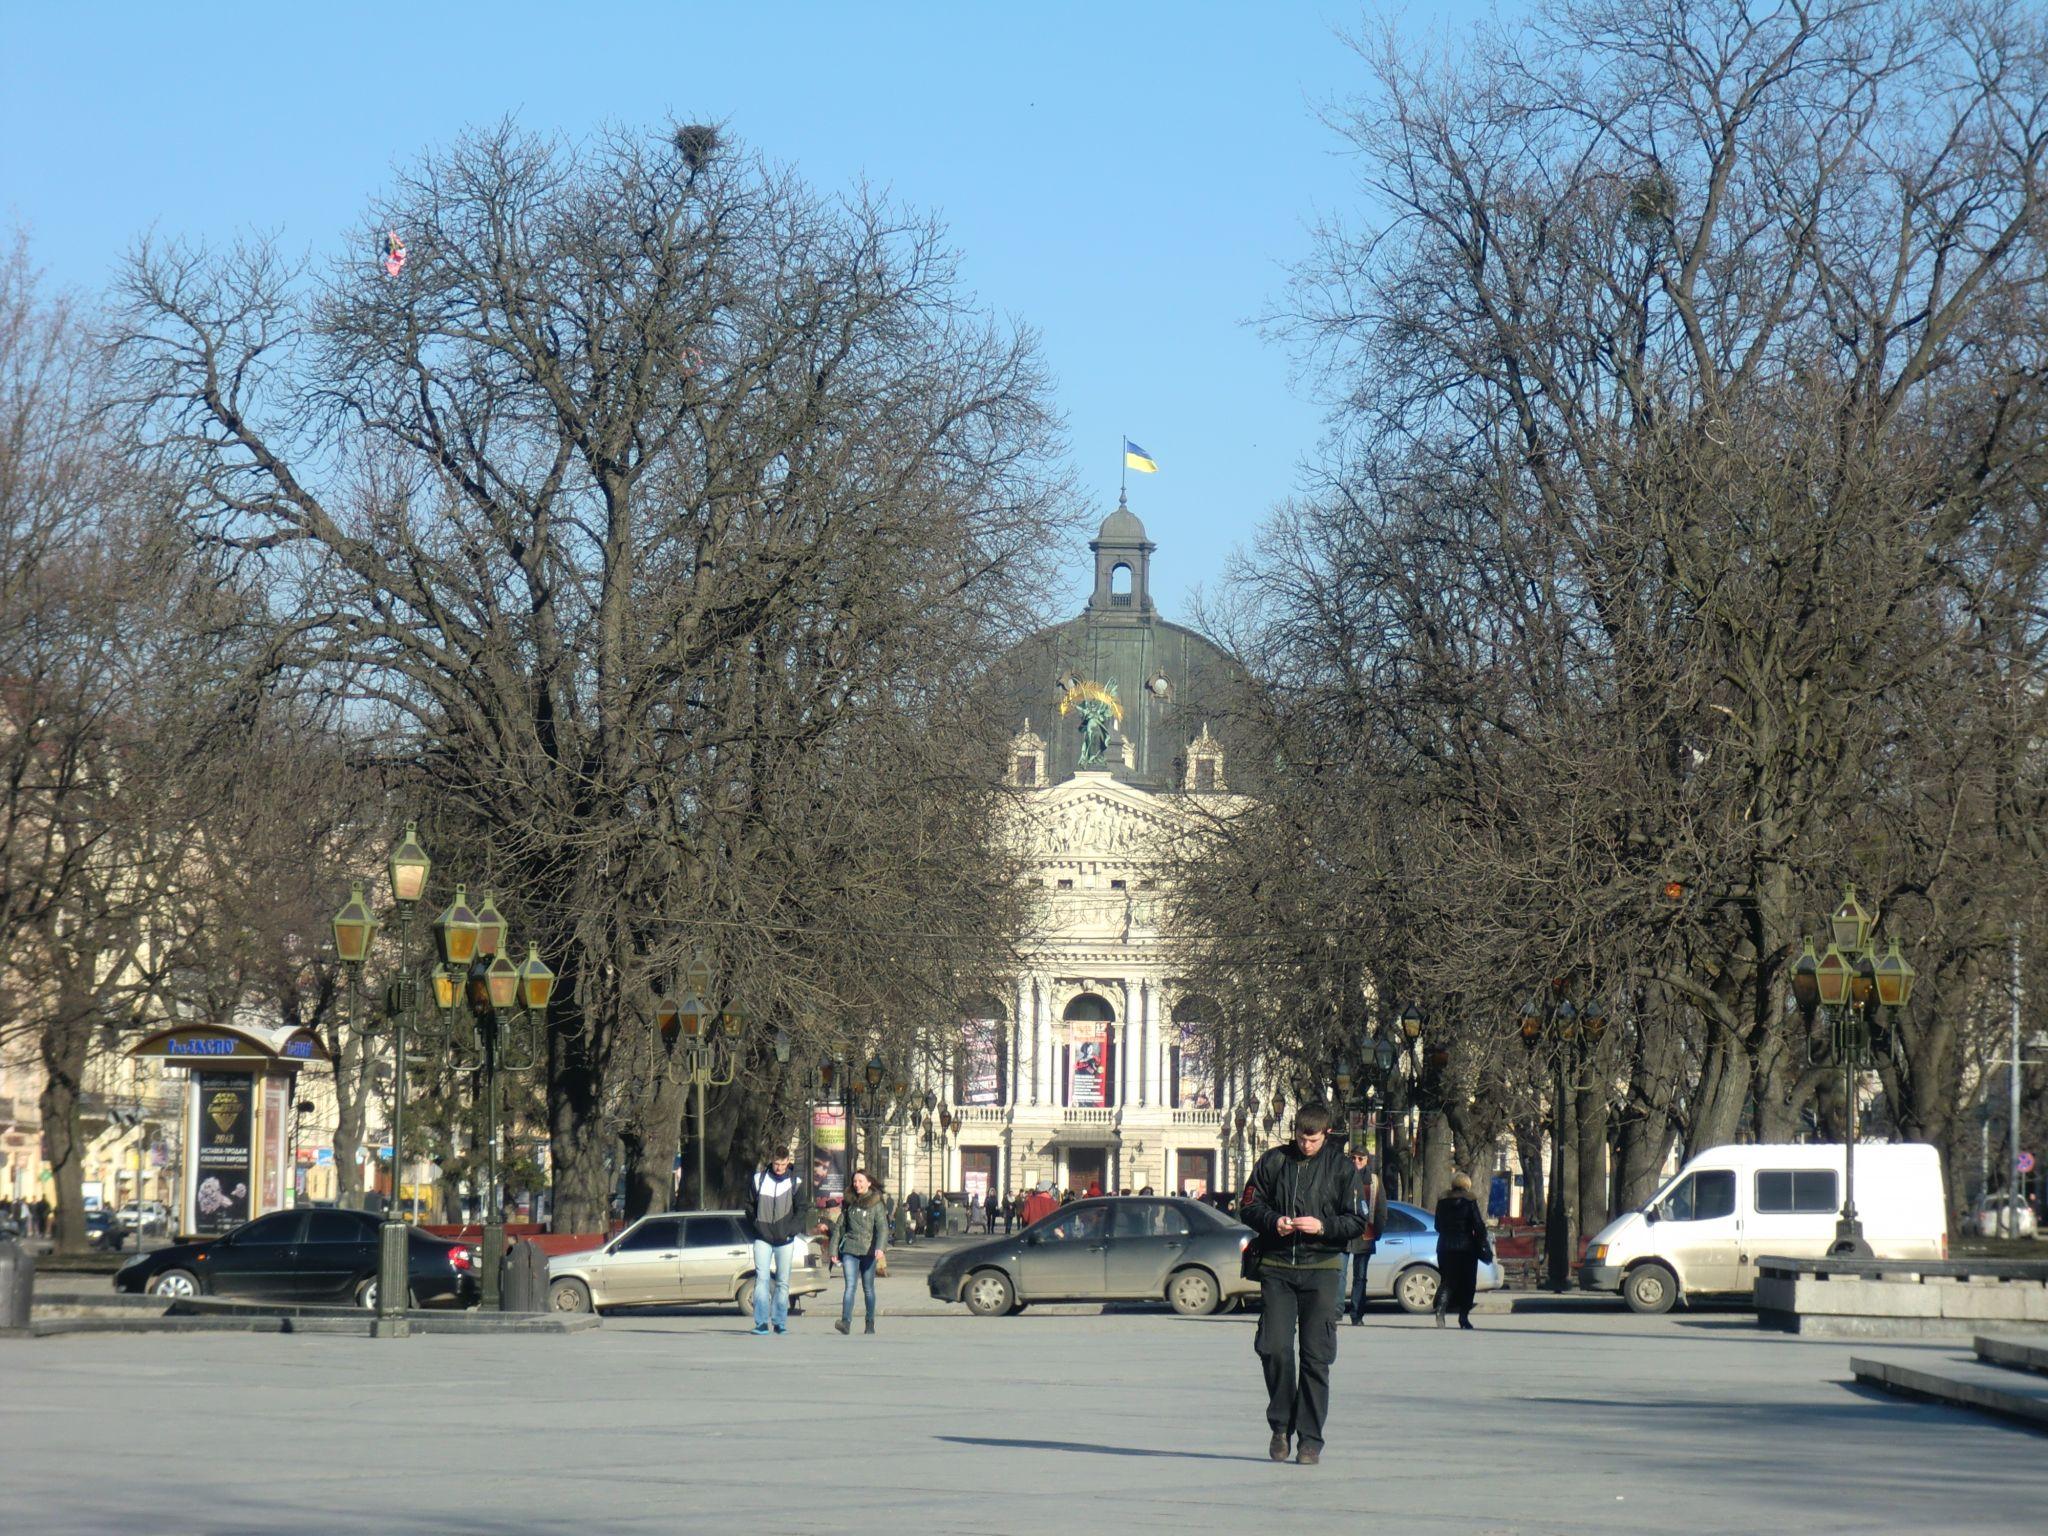 Lviv buildings 3 - Lviv, the Ukrainian pearl